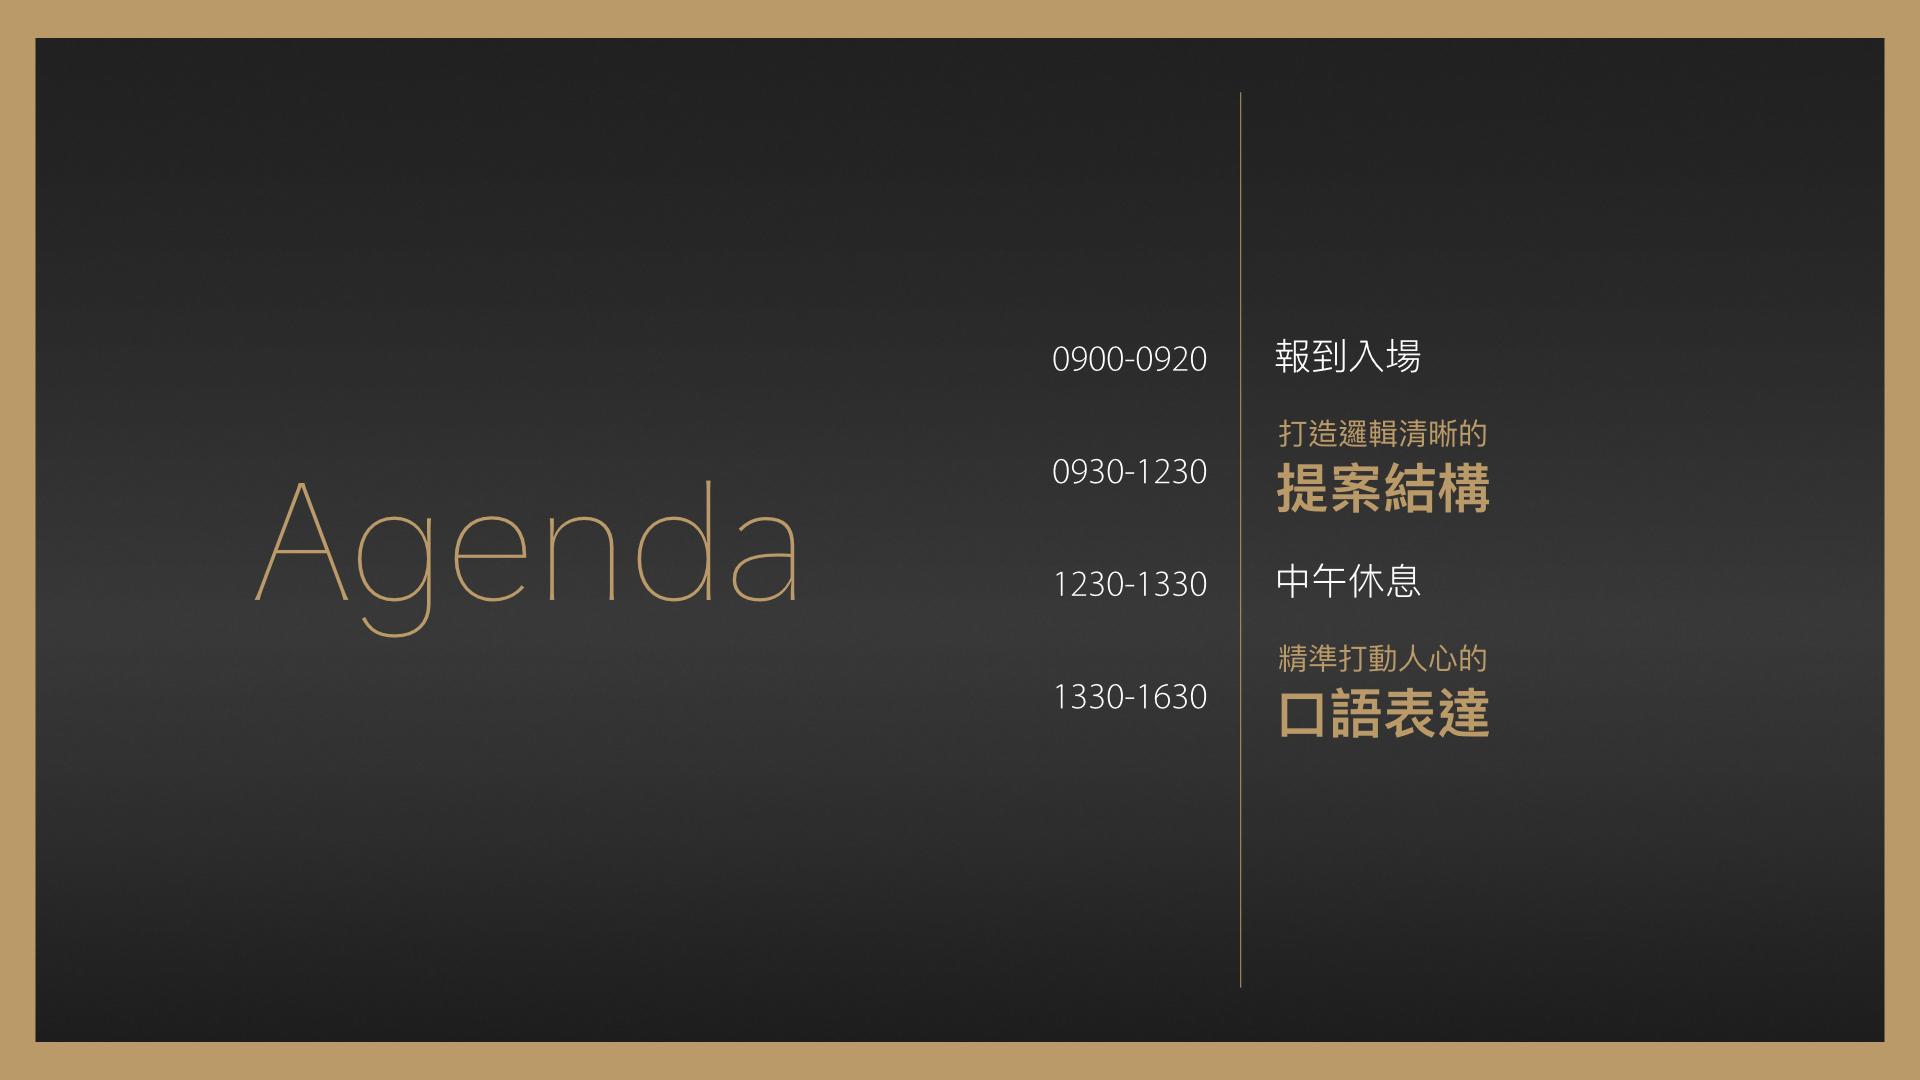 BFAcademy #5 林大班 周震宇.007.jpeg